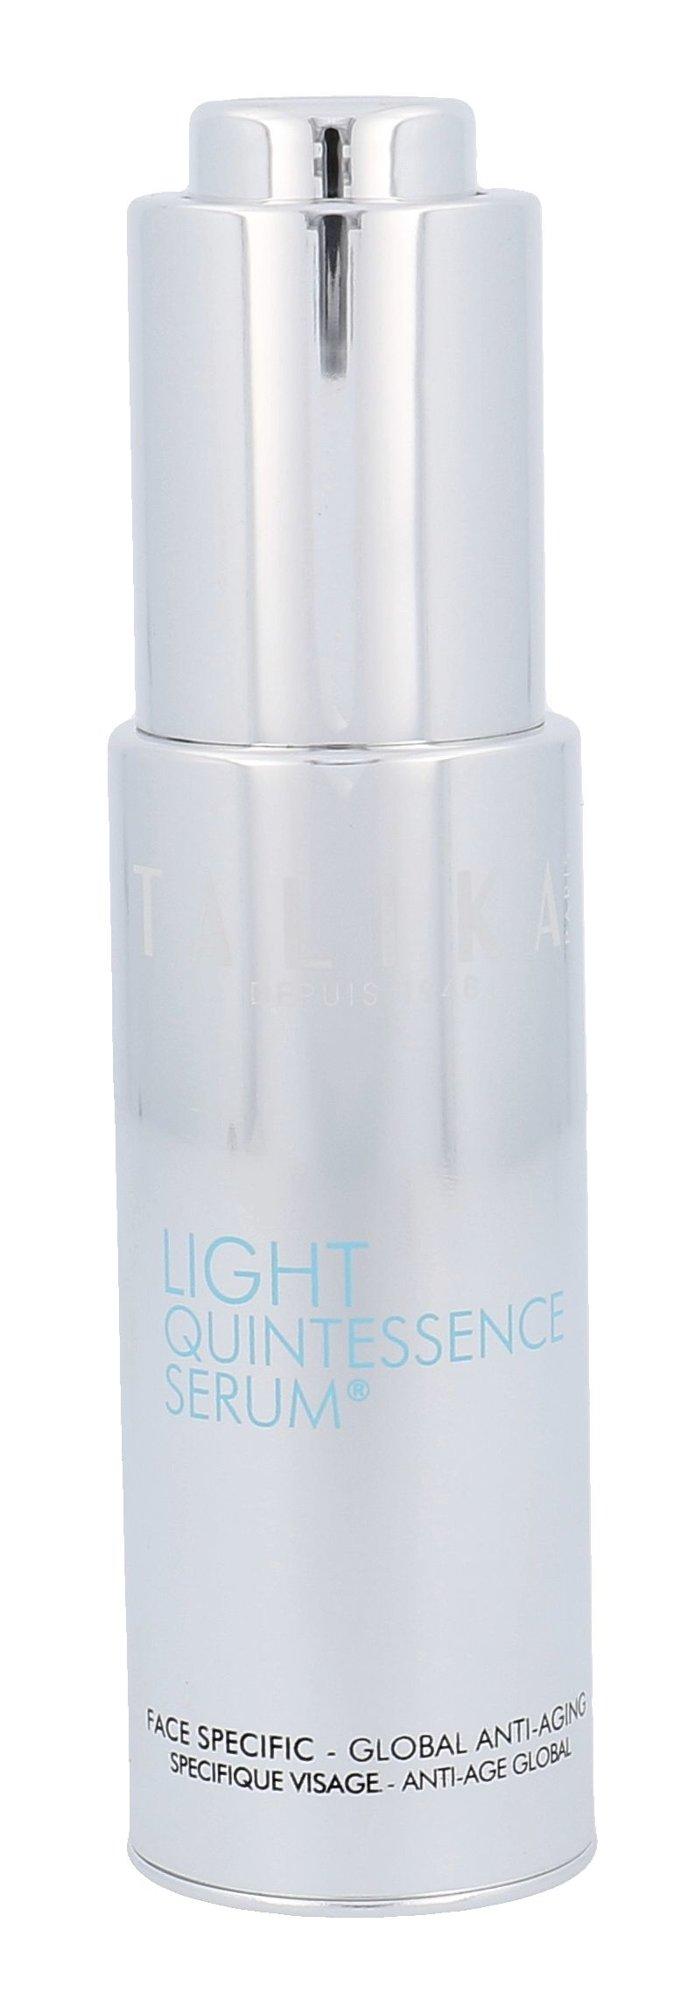 Talika Light Quintessence Serum Cosmetic 30ml